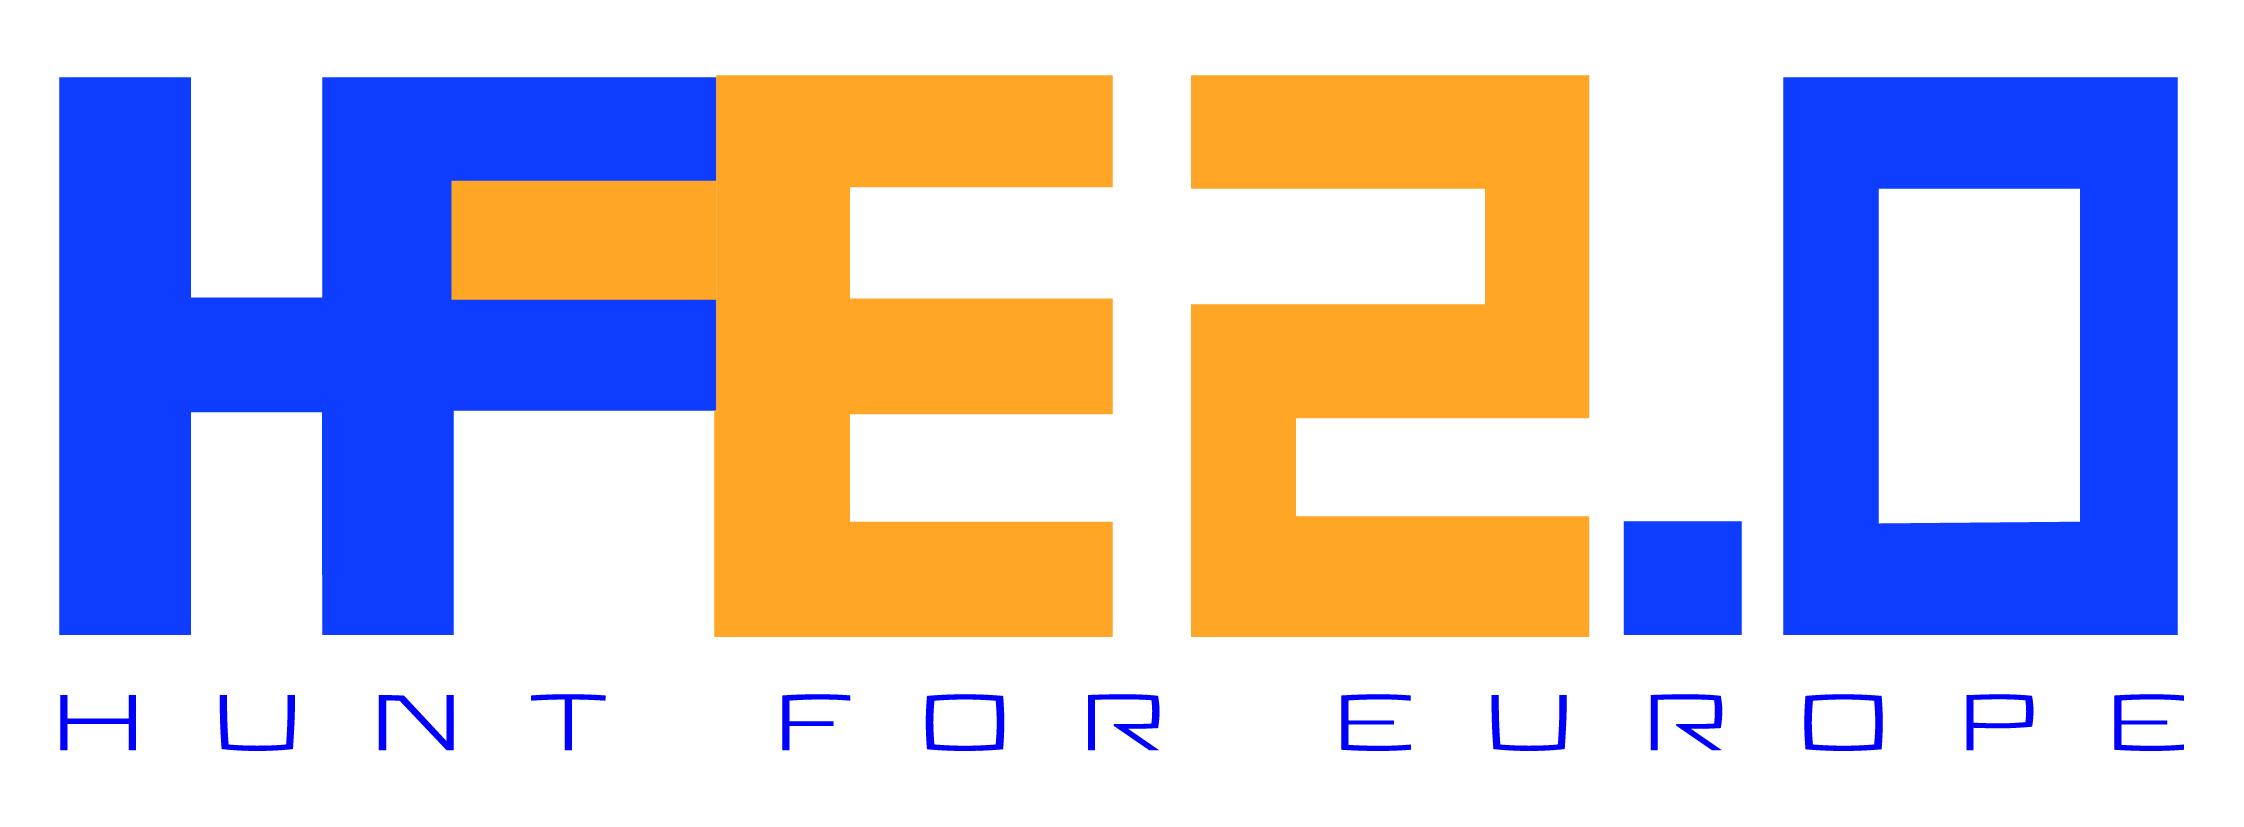 Hunt For Europe